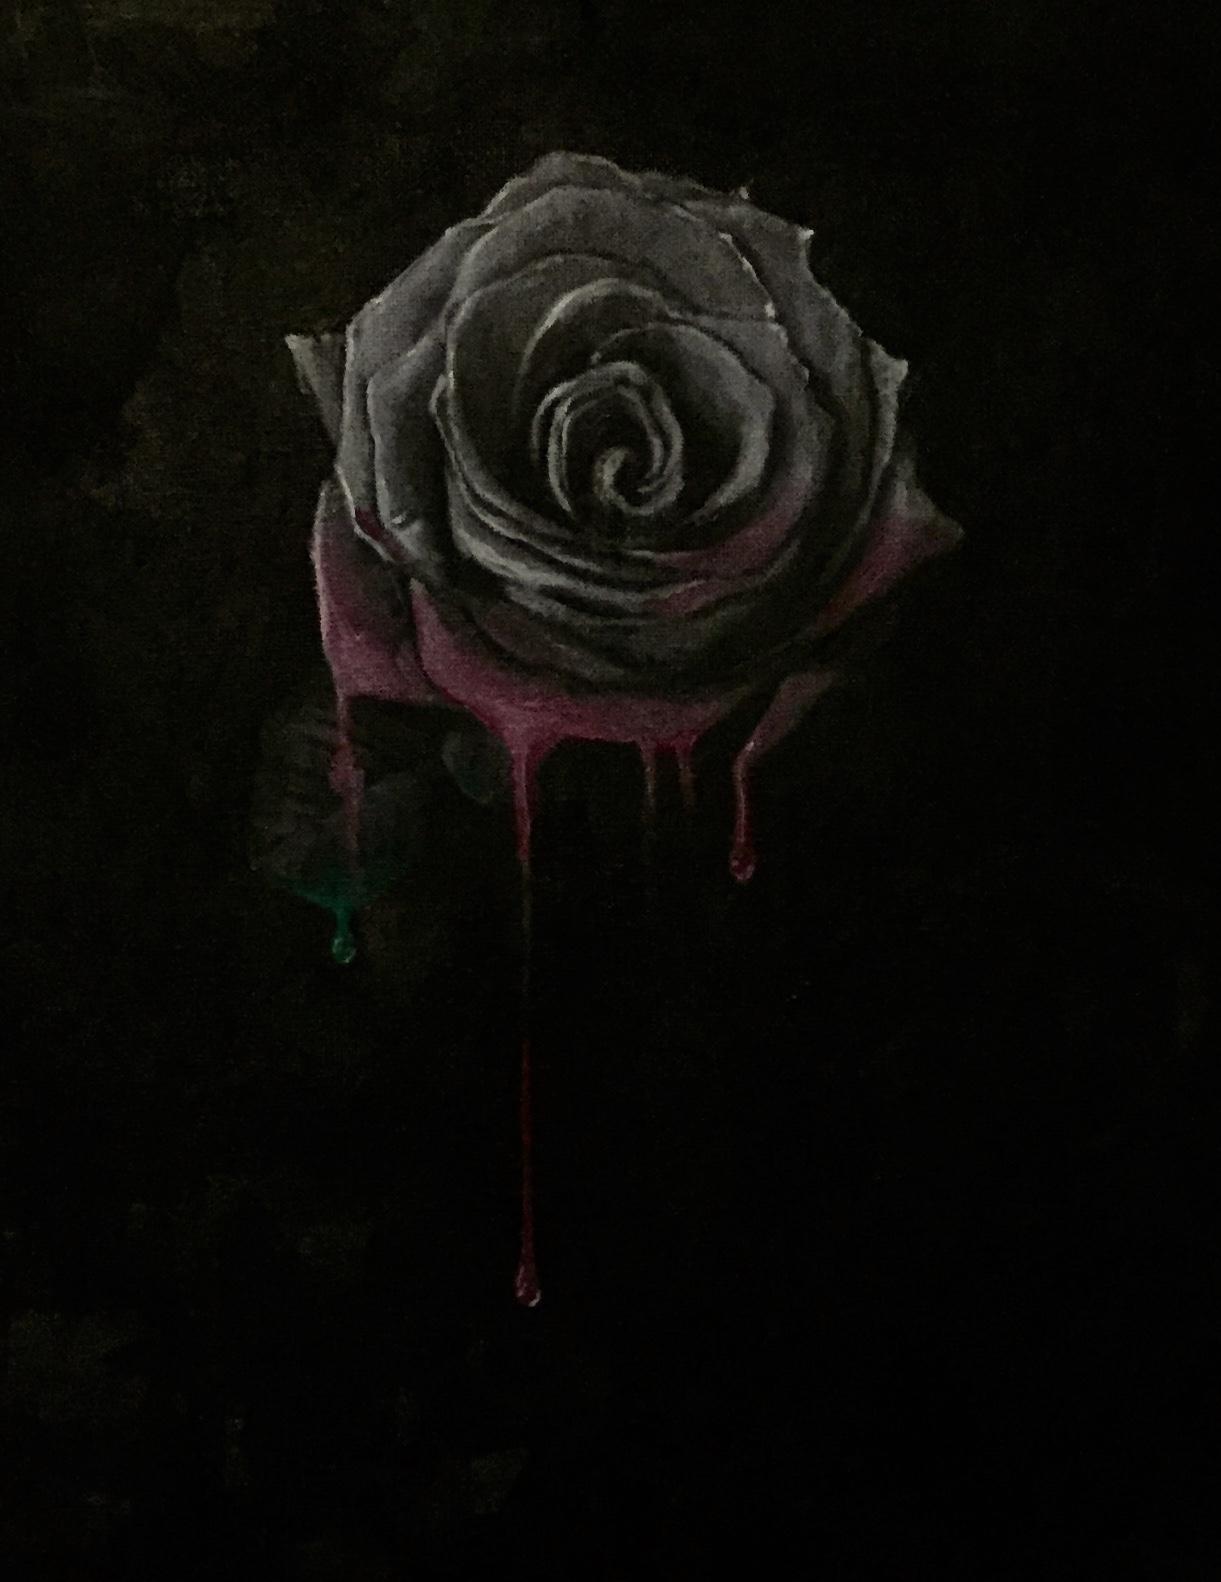 Study of a Black Rose